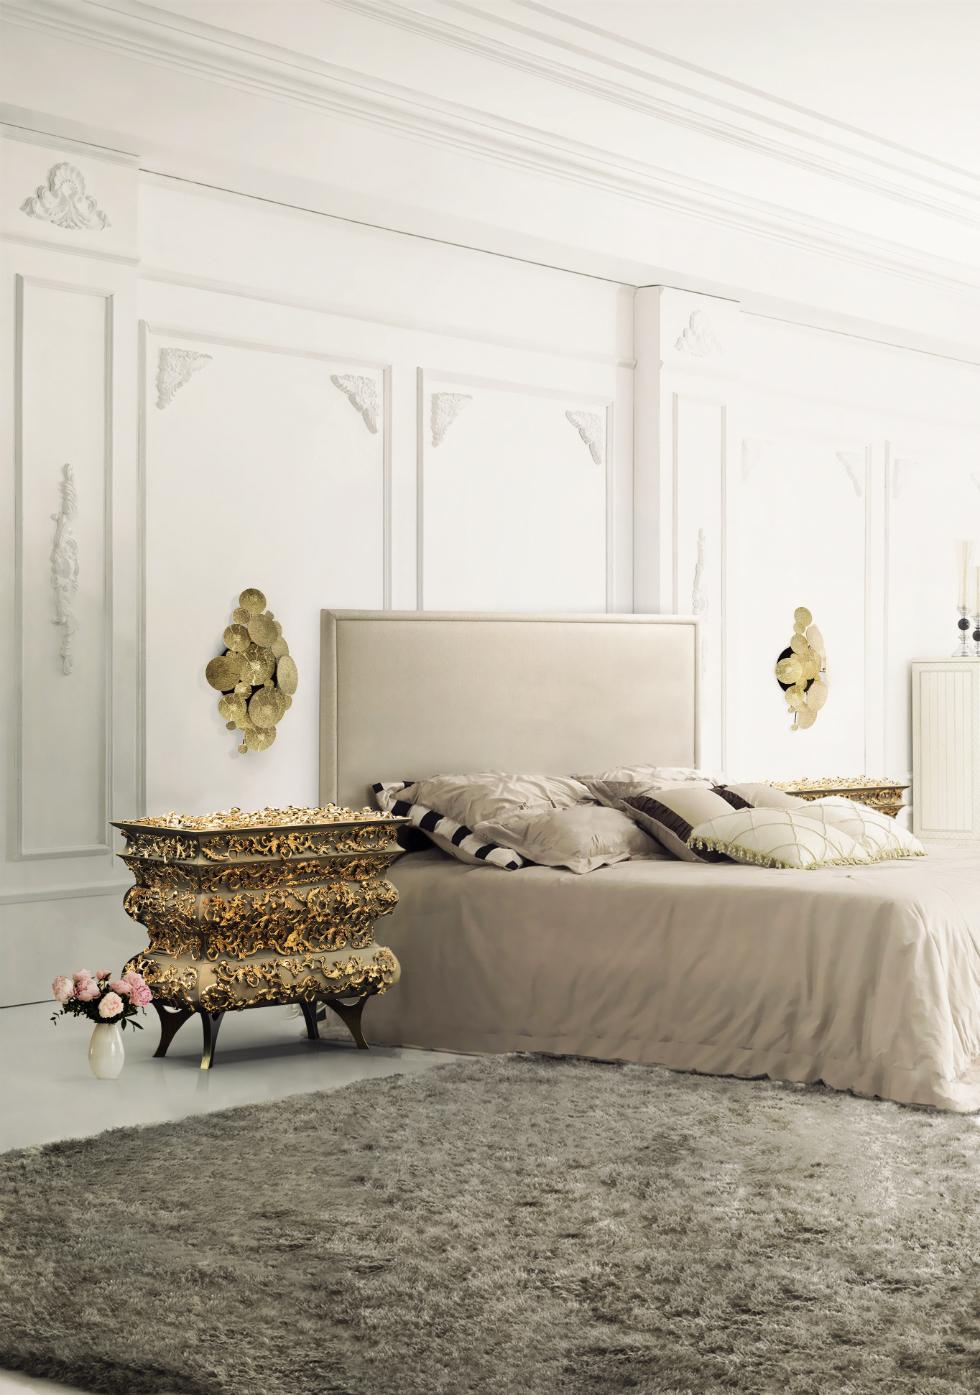 Minimal Bedroom 5 Clever Tips to Make Your Minimal Bedroom the Best Decor Possible crochet bedside